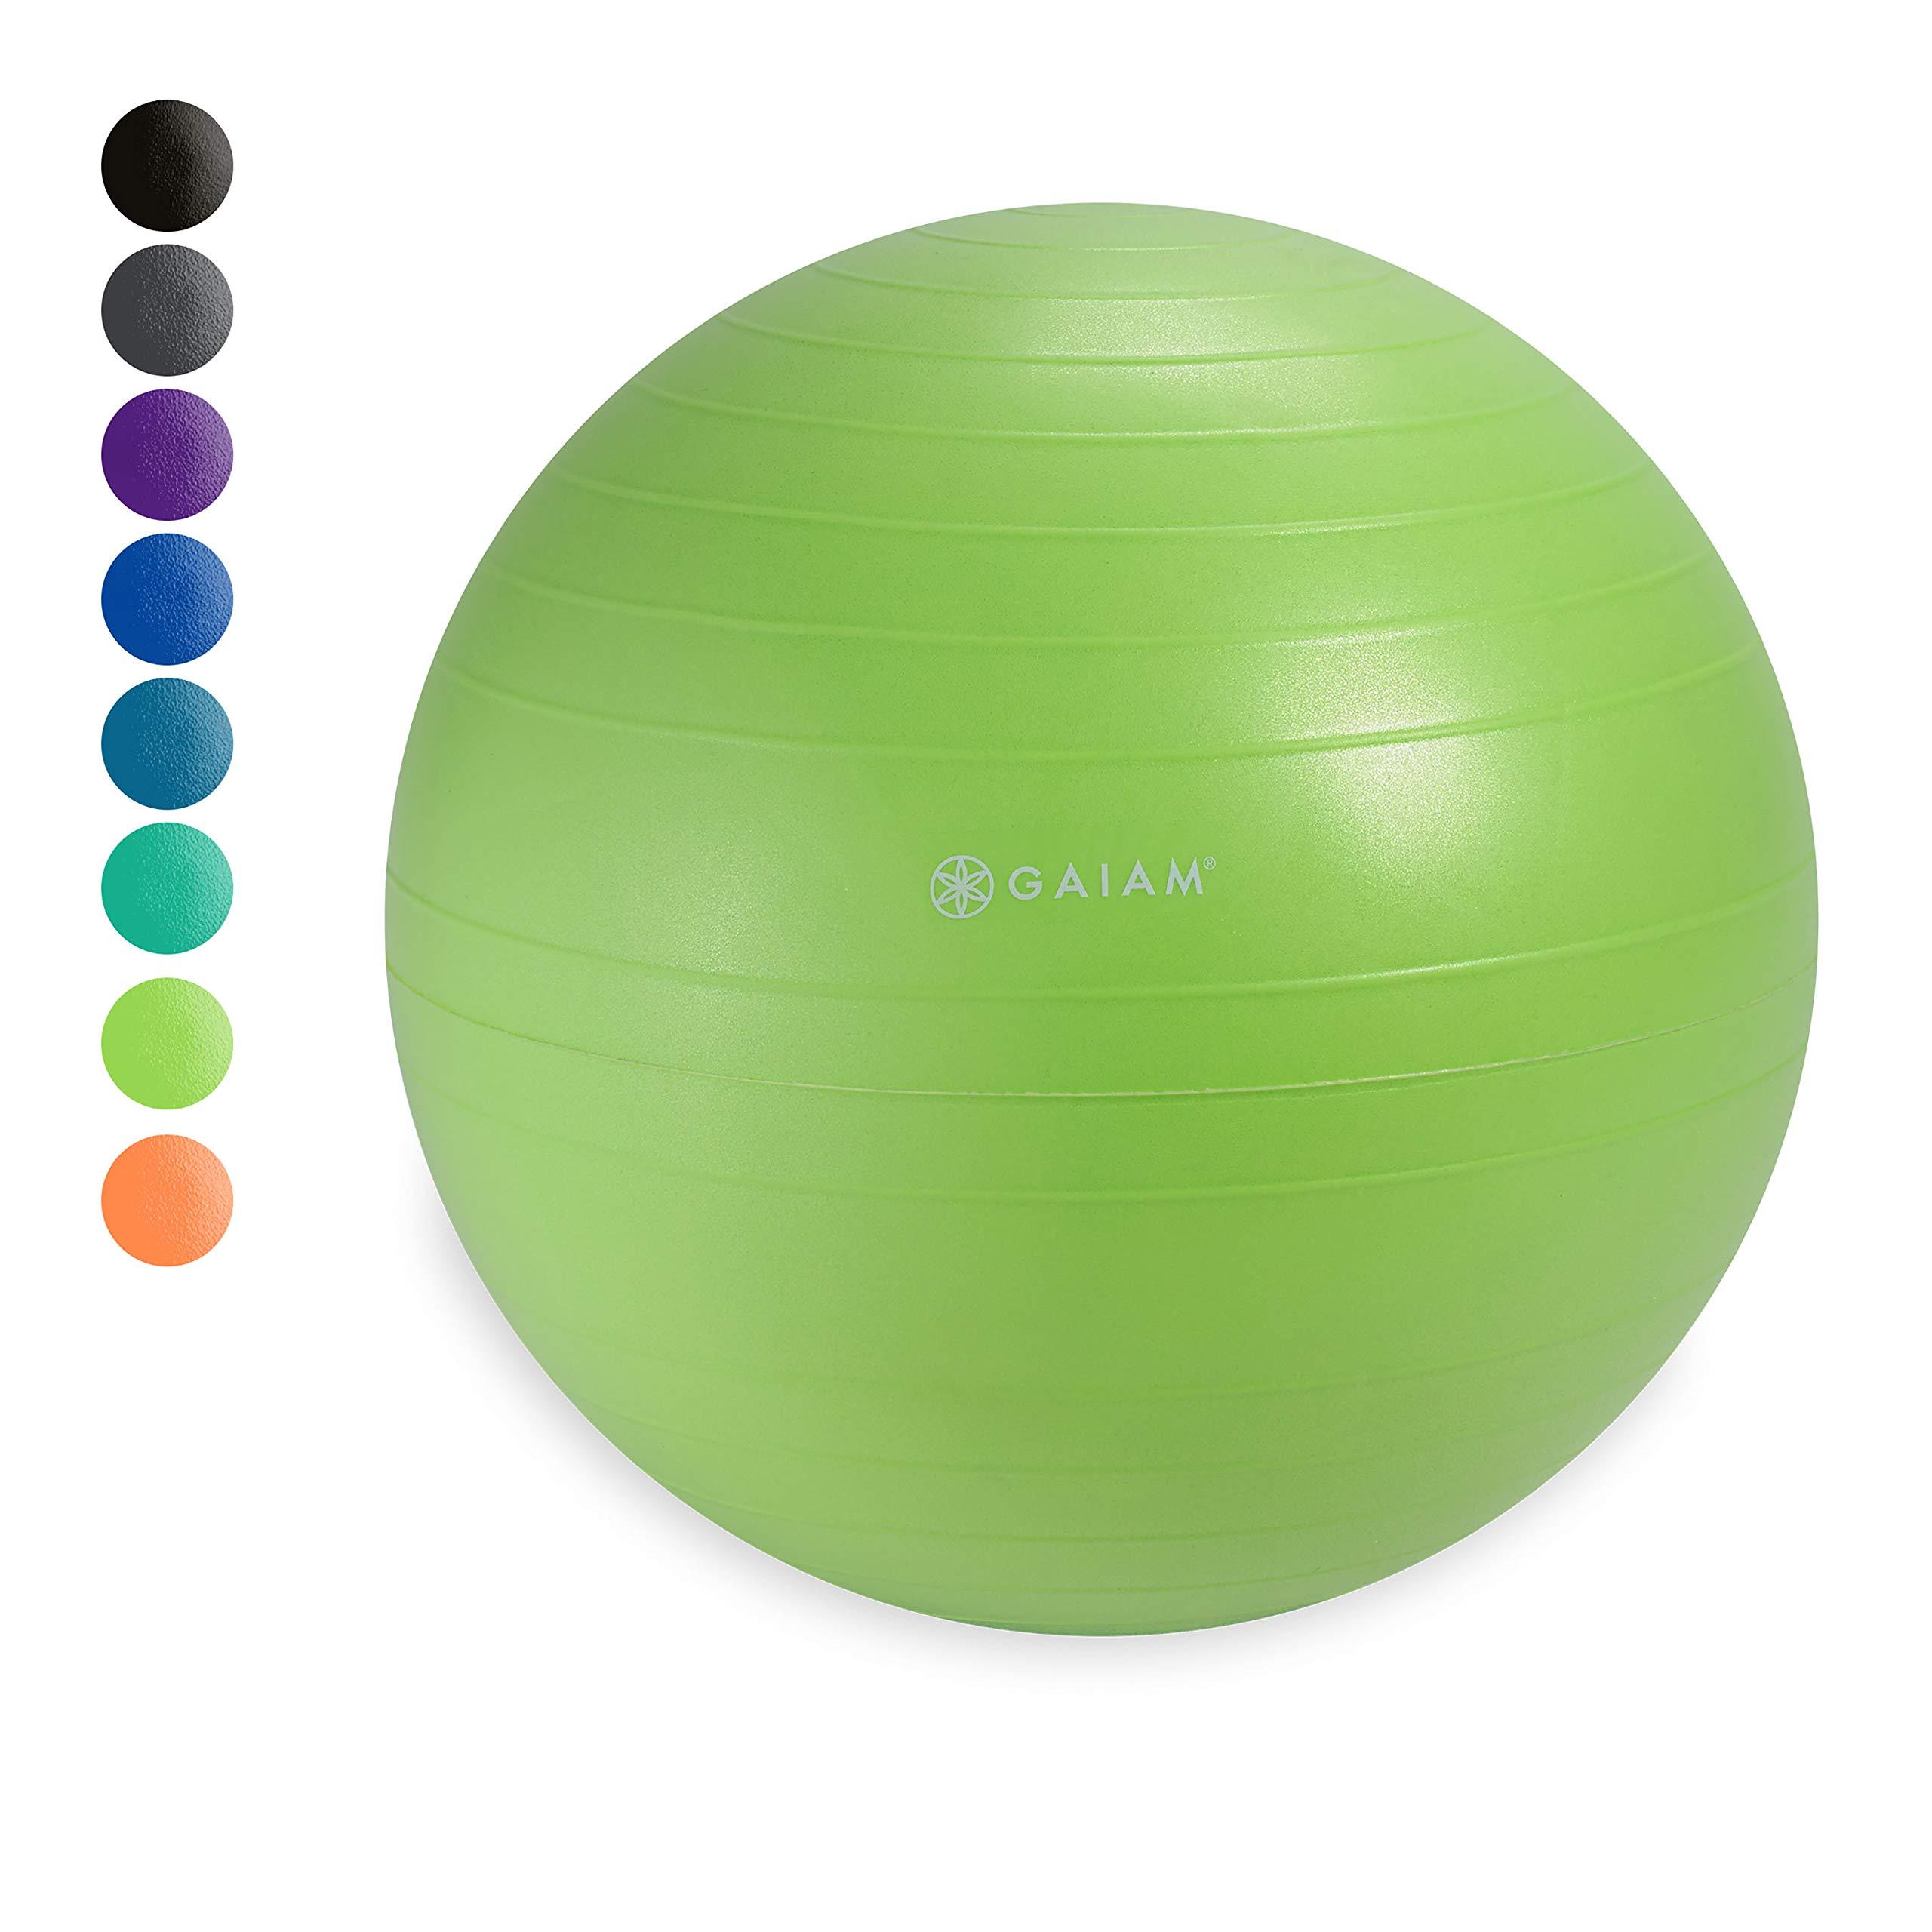 Gaiam Classic Balance Ball Chair Ball - Extra 52cm Balance Ball for Classic Balance Ball Chairs, Wasabi